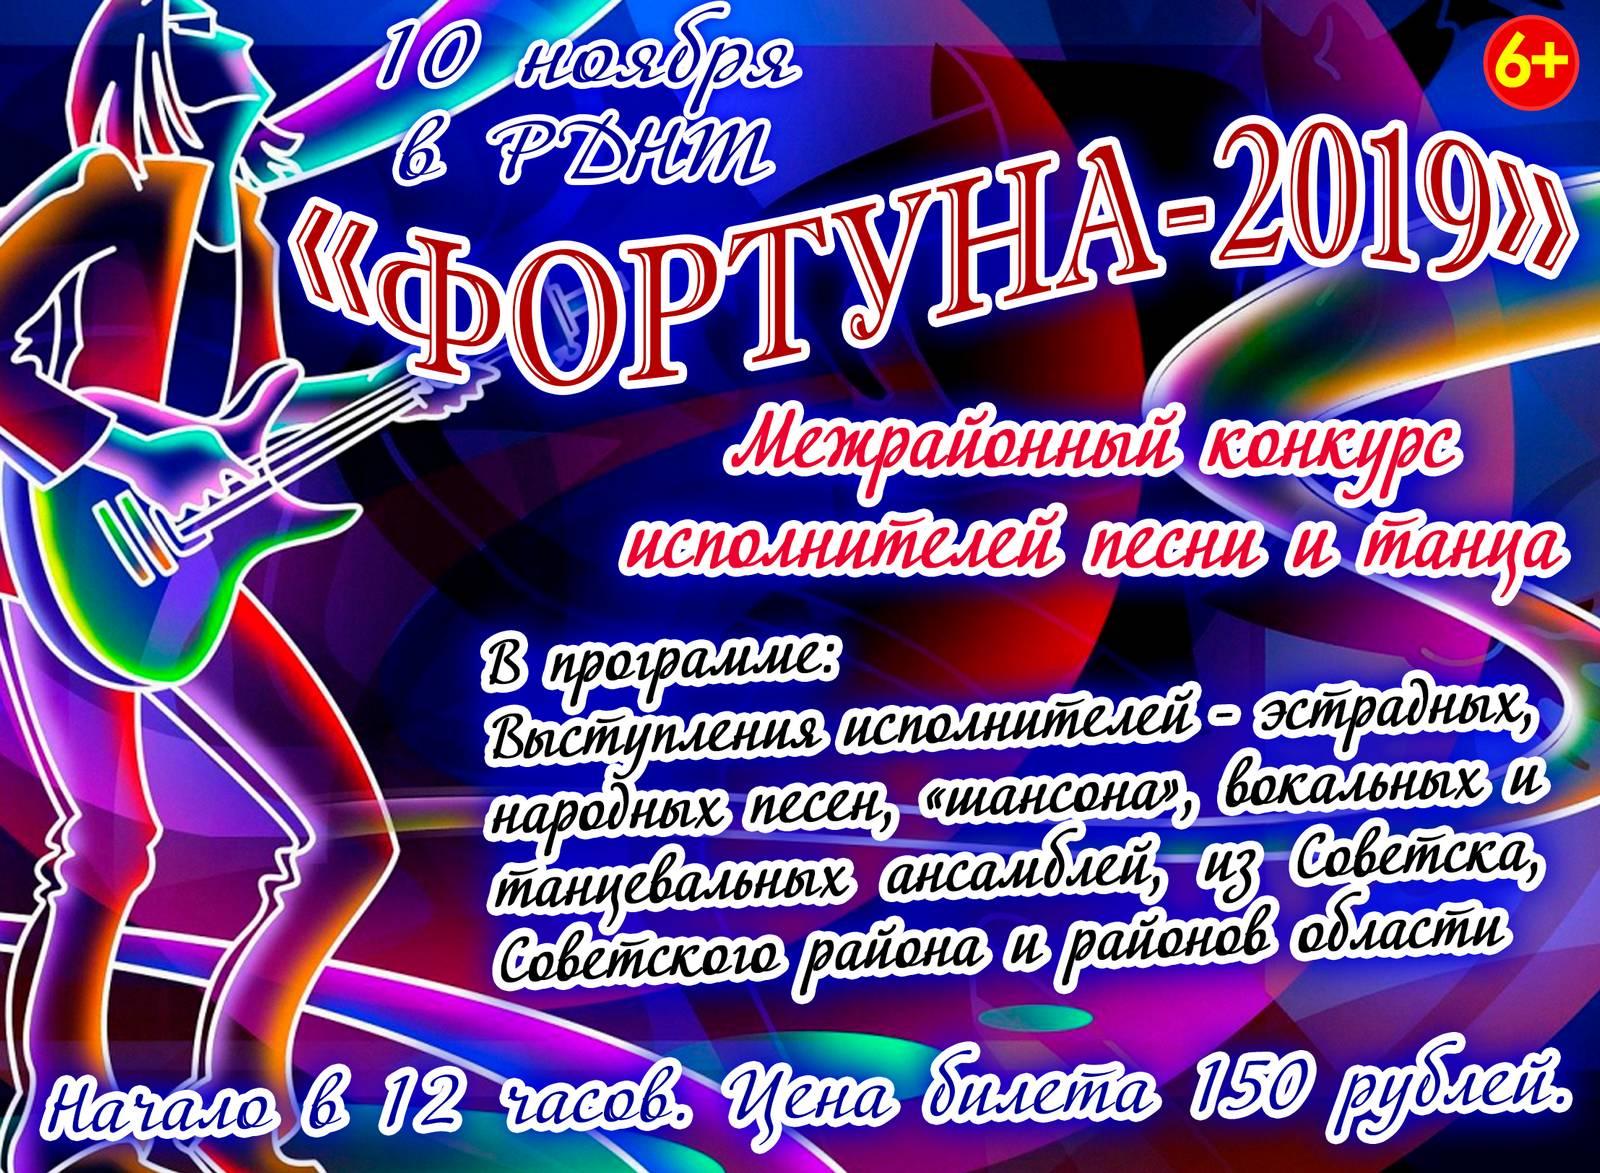 Советск, РДНТ. «Фортуна–2019»